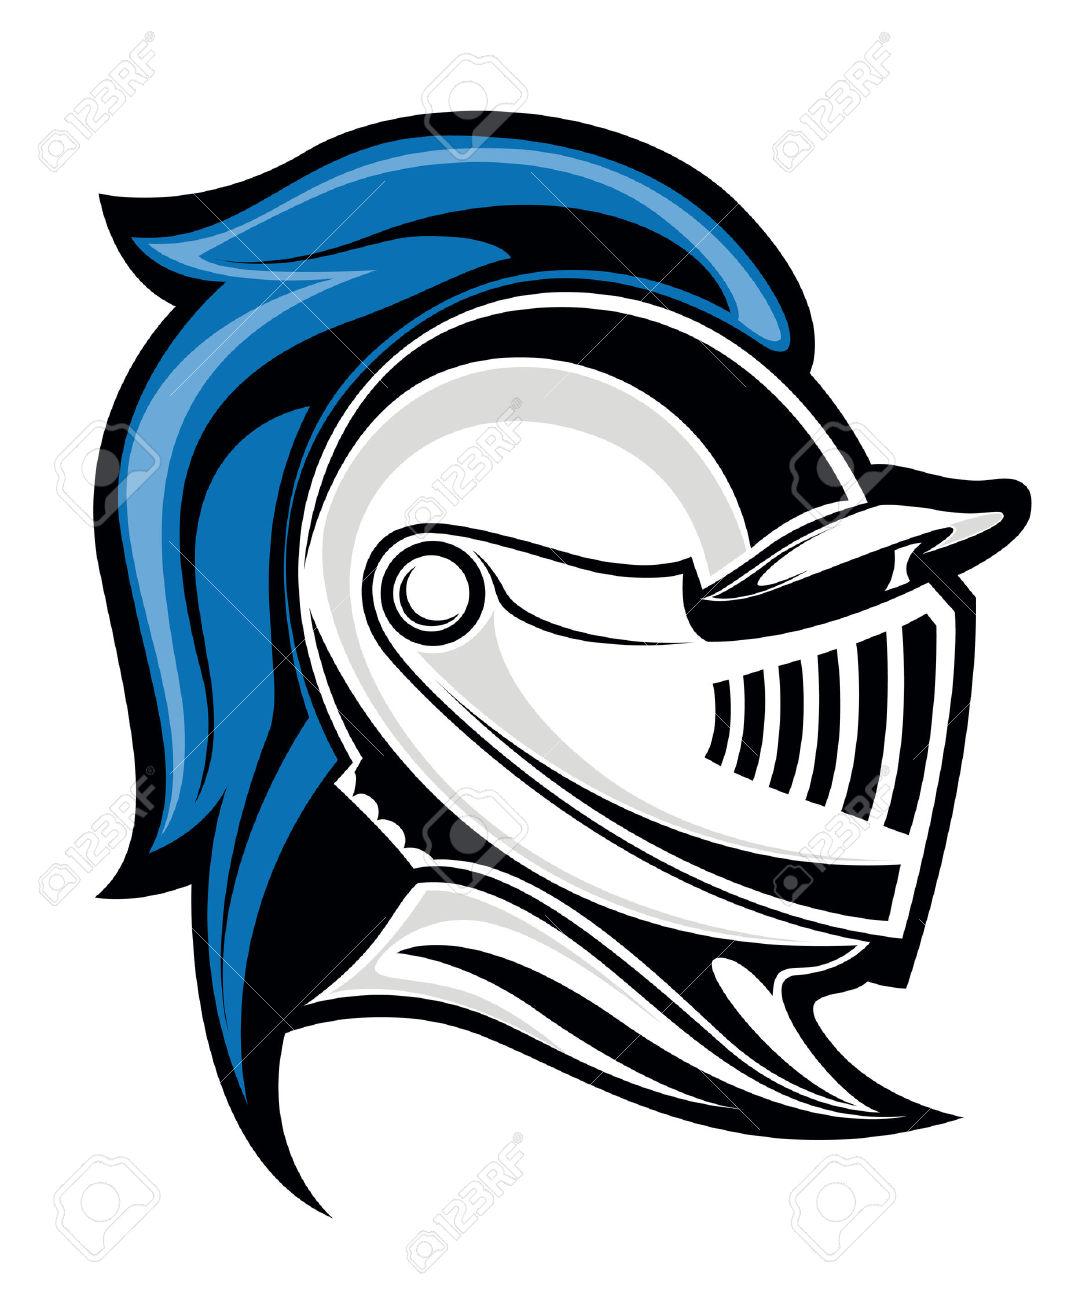 clipart knight head - Clipground